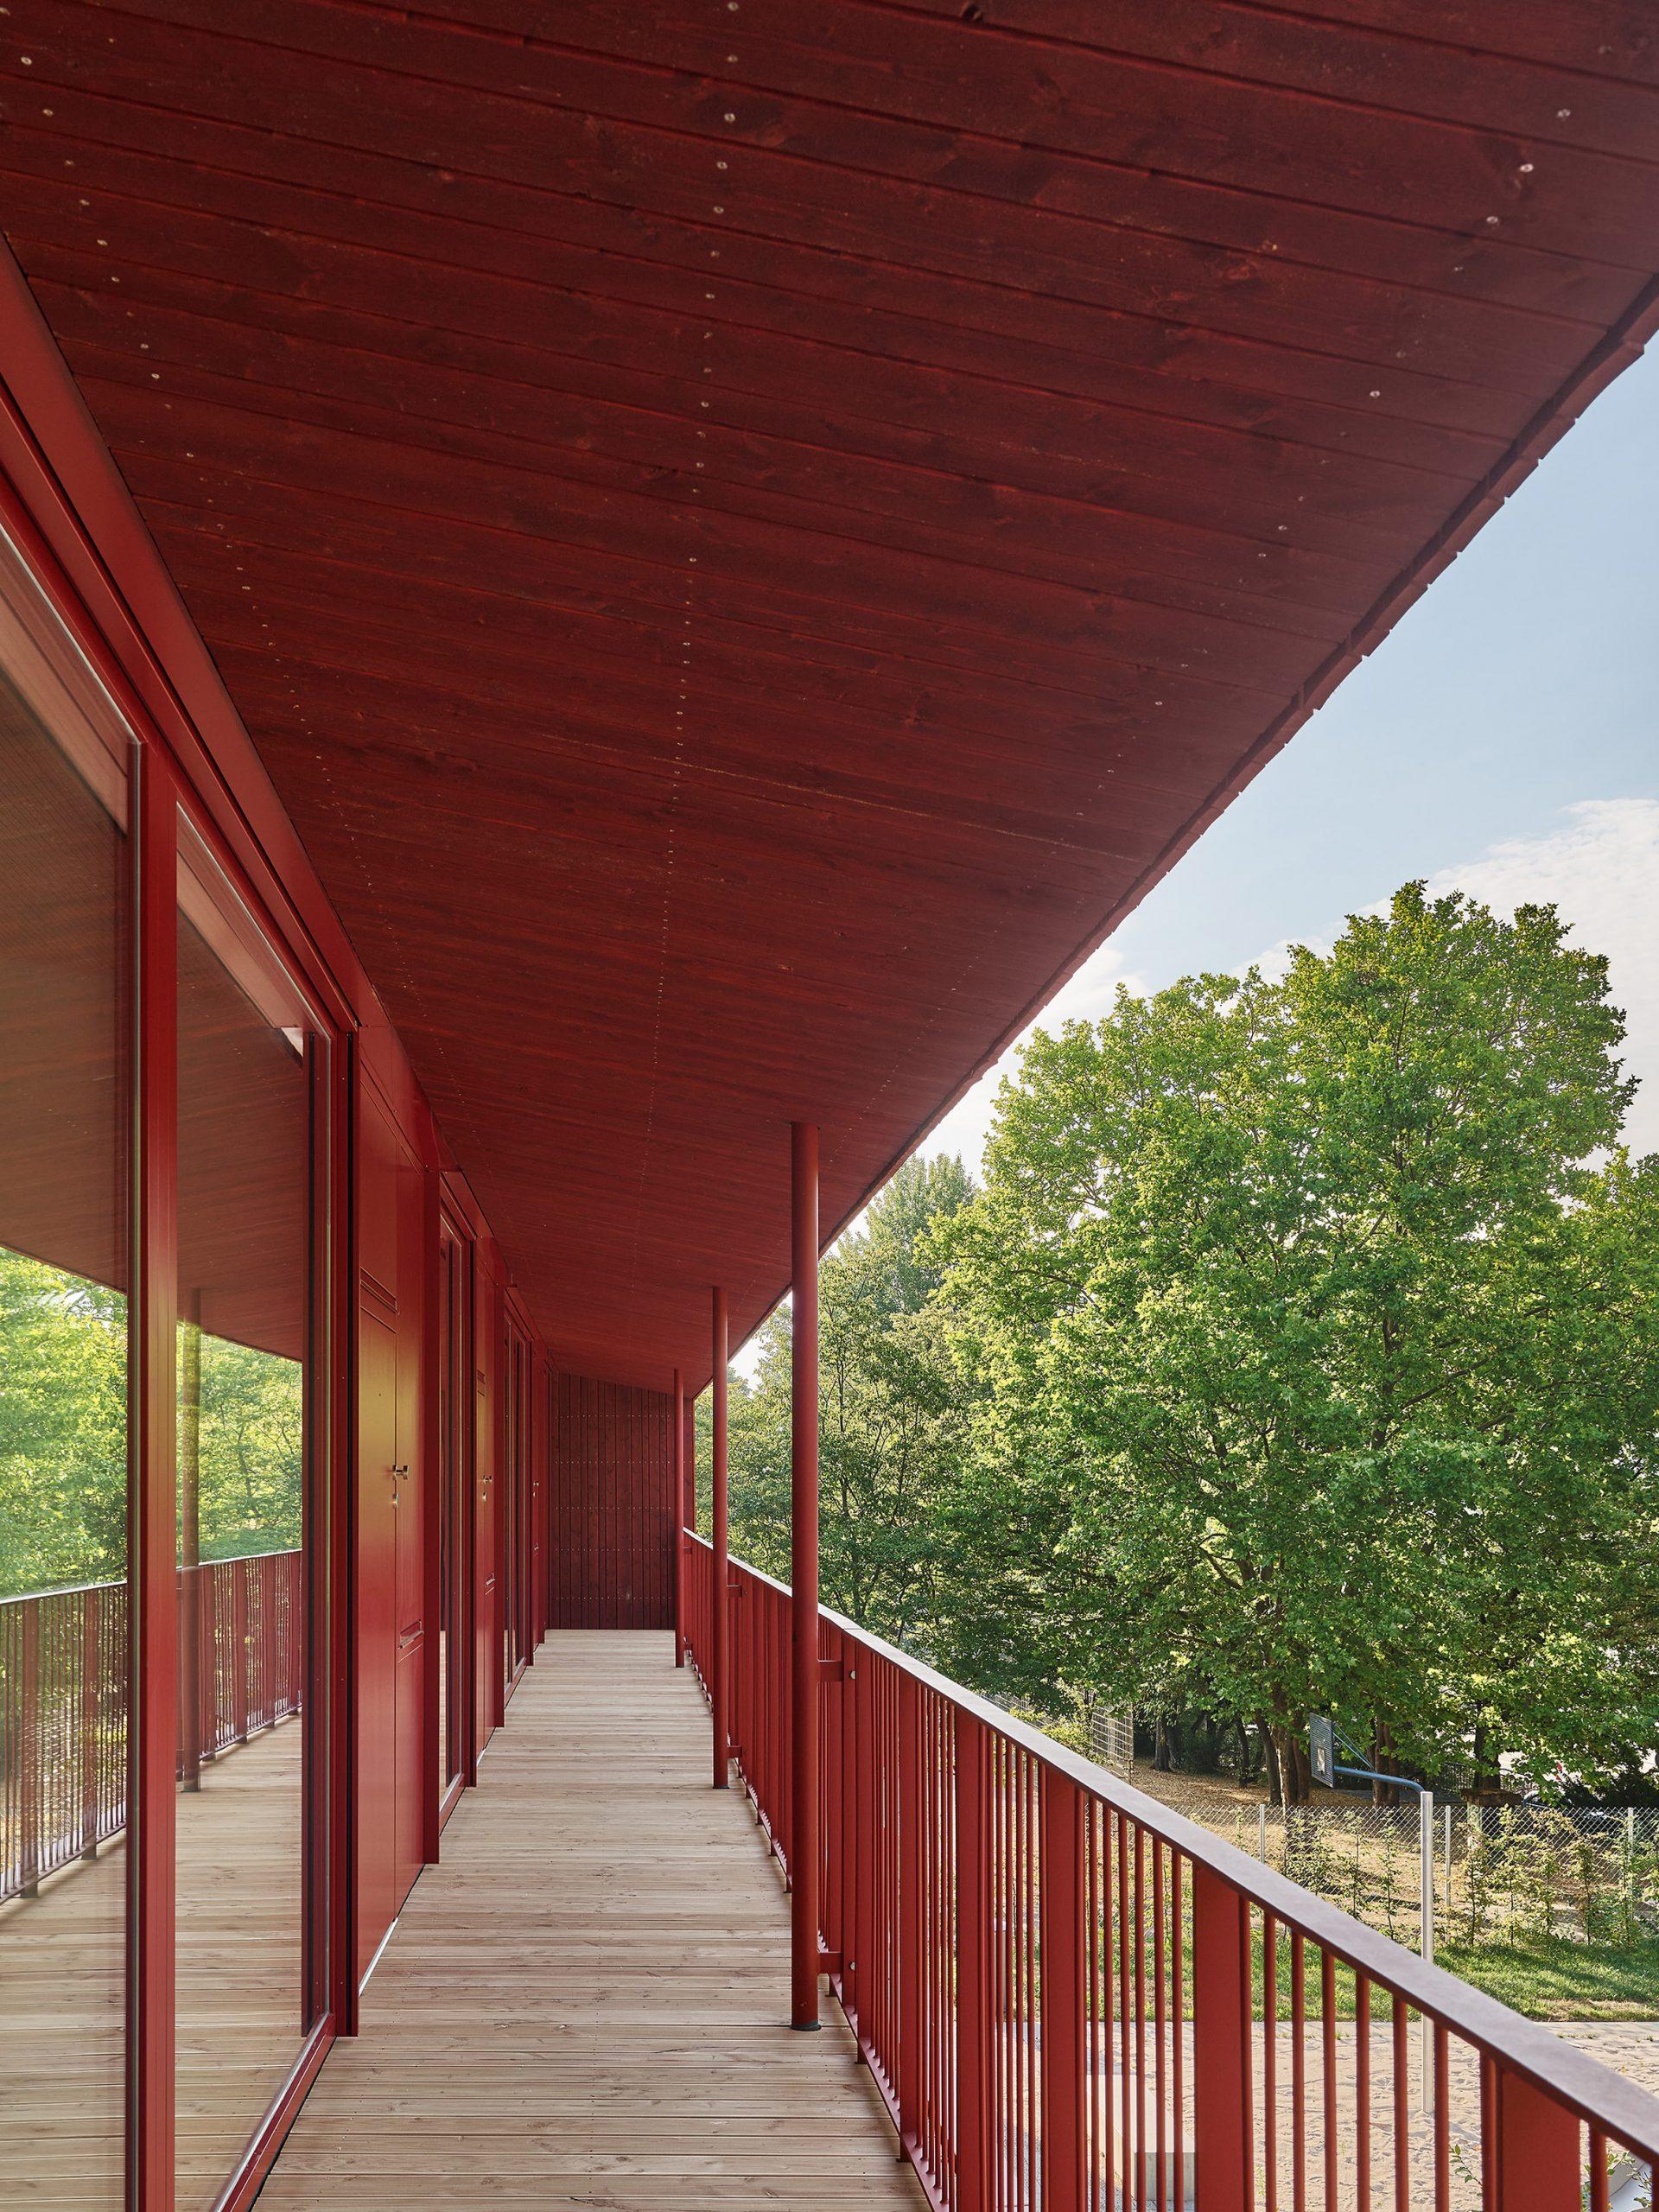 Red railings line the balcony terrace of daycare centre by Birk Heilmeyer und Frenzel Architekten